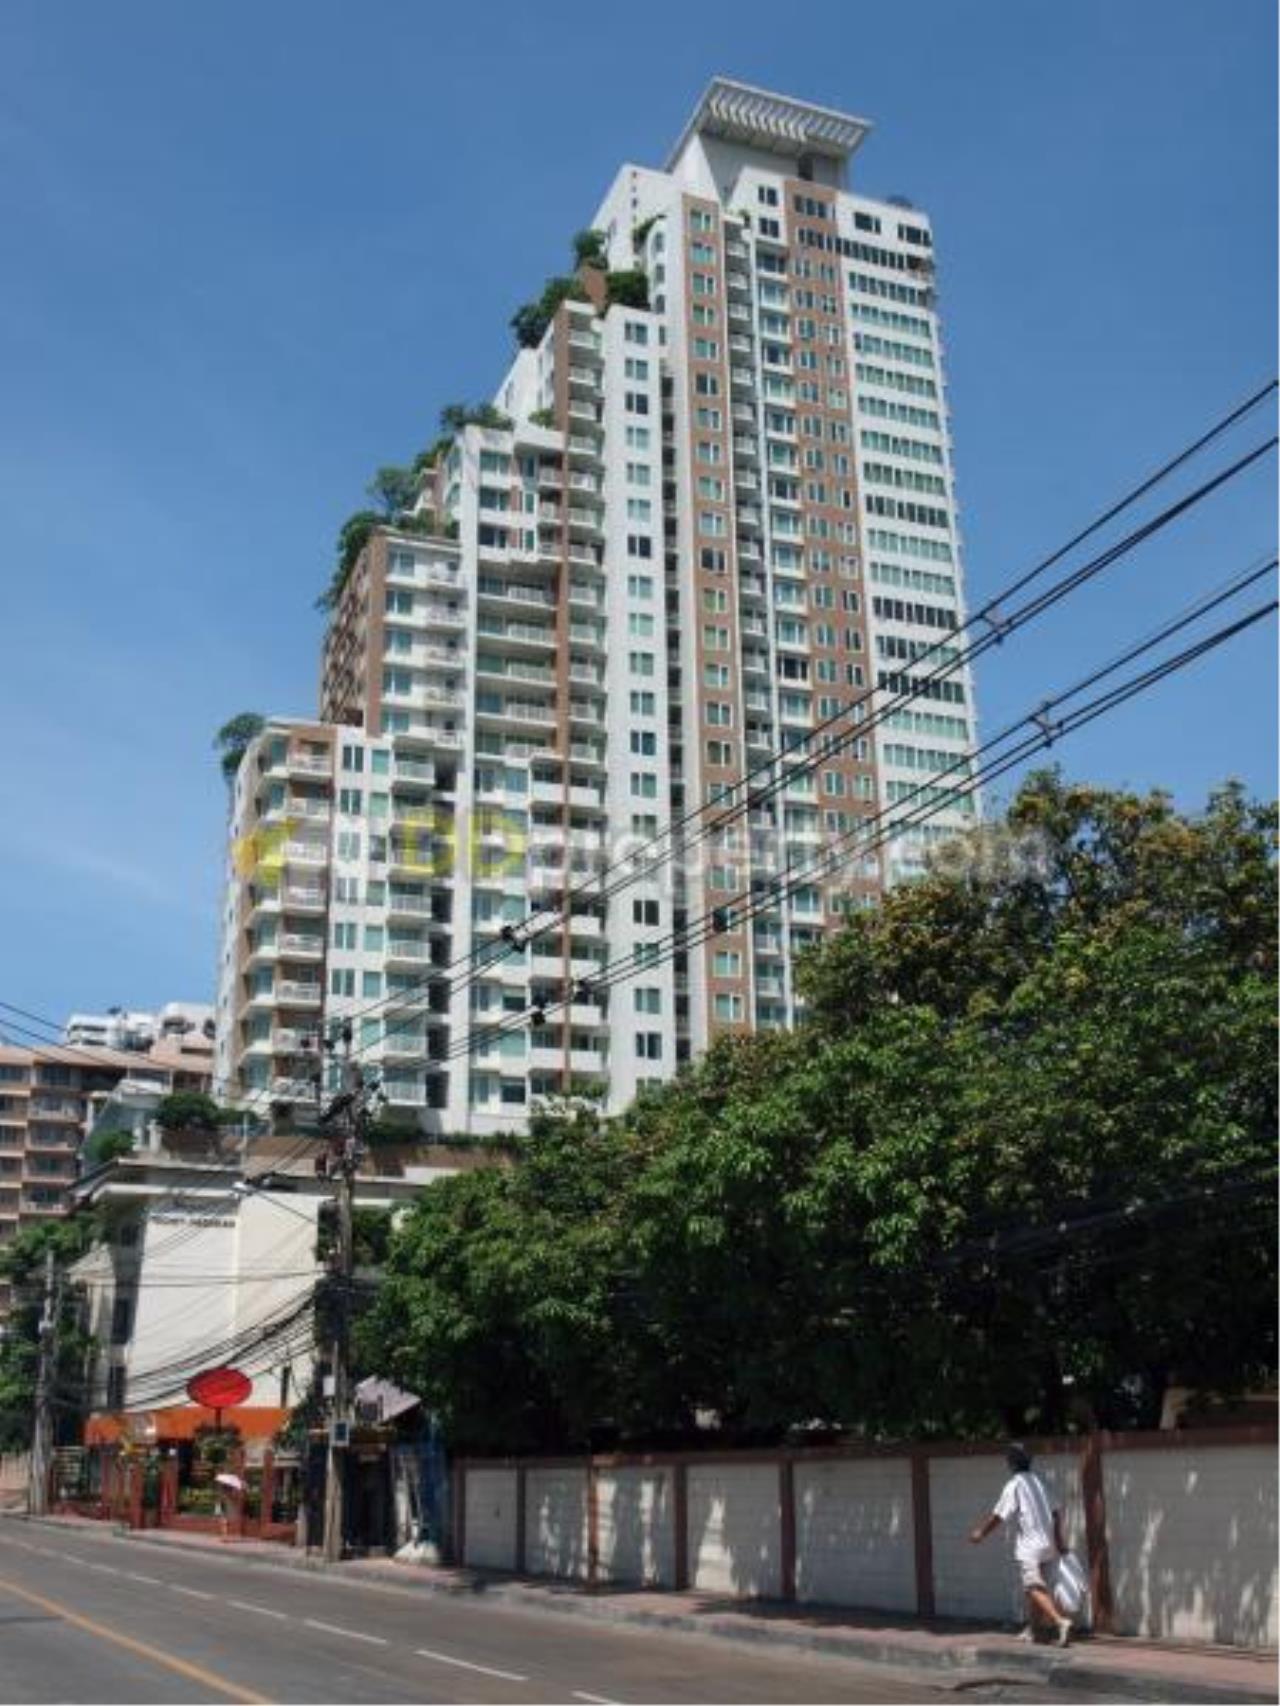 Quality Life Property Agency's ***R E N T*** ! SIRI RESIDENCE | 2 BED 2 BATH | 110 SQ. M. 1